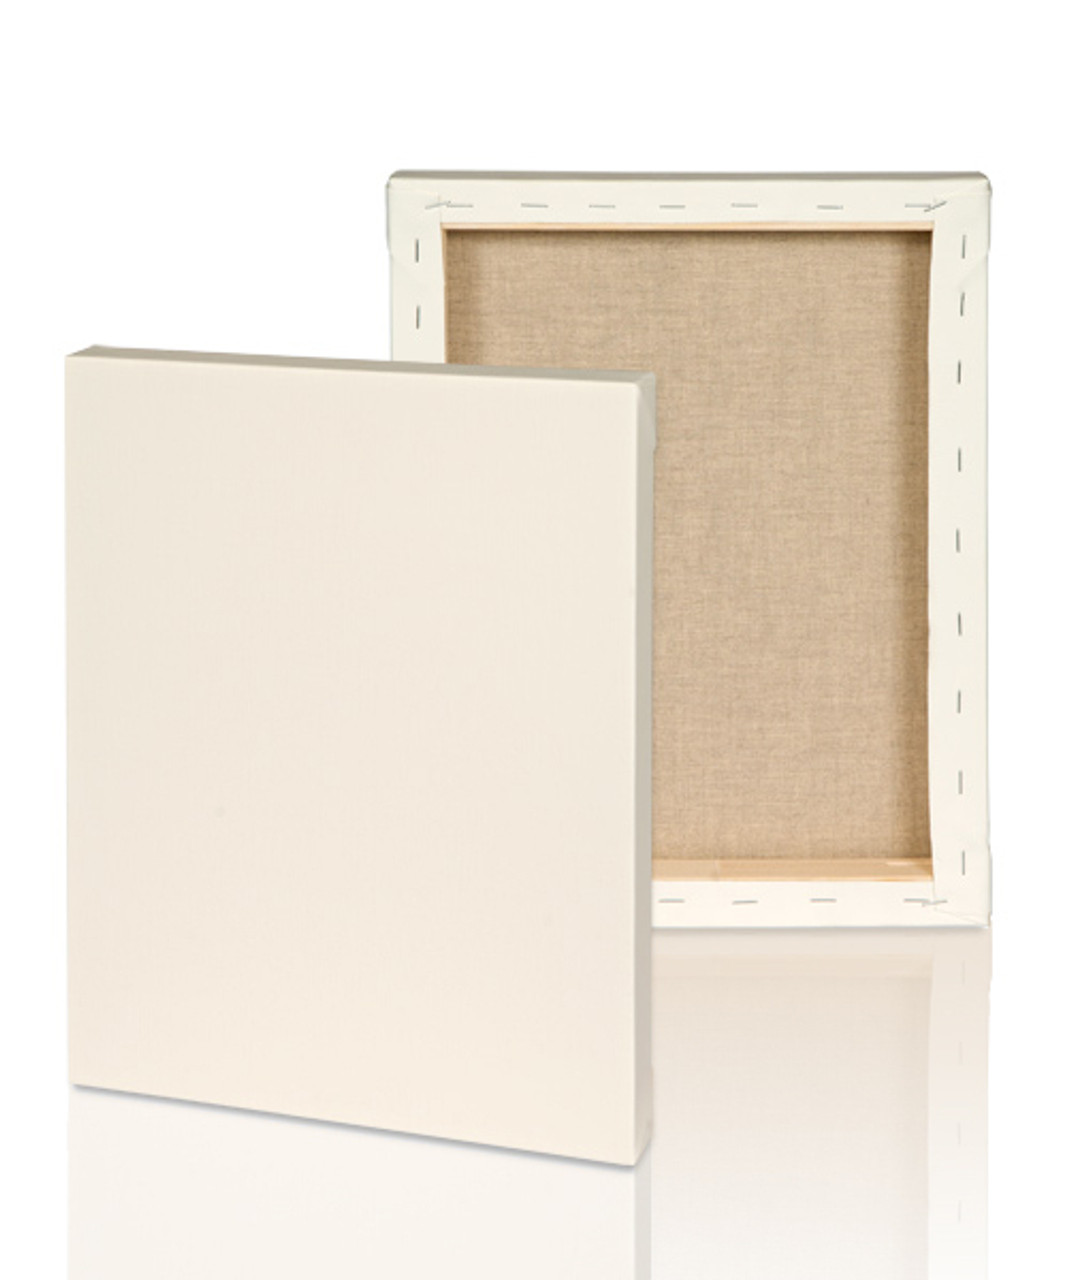 medium grain 1 1 2 stretched linen canvas 9x12 box of 5